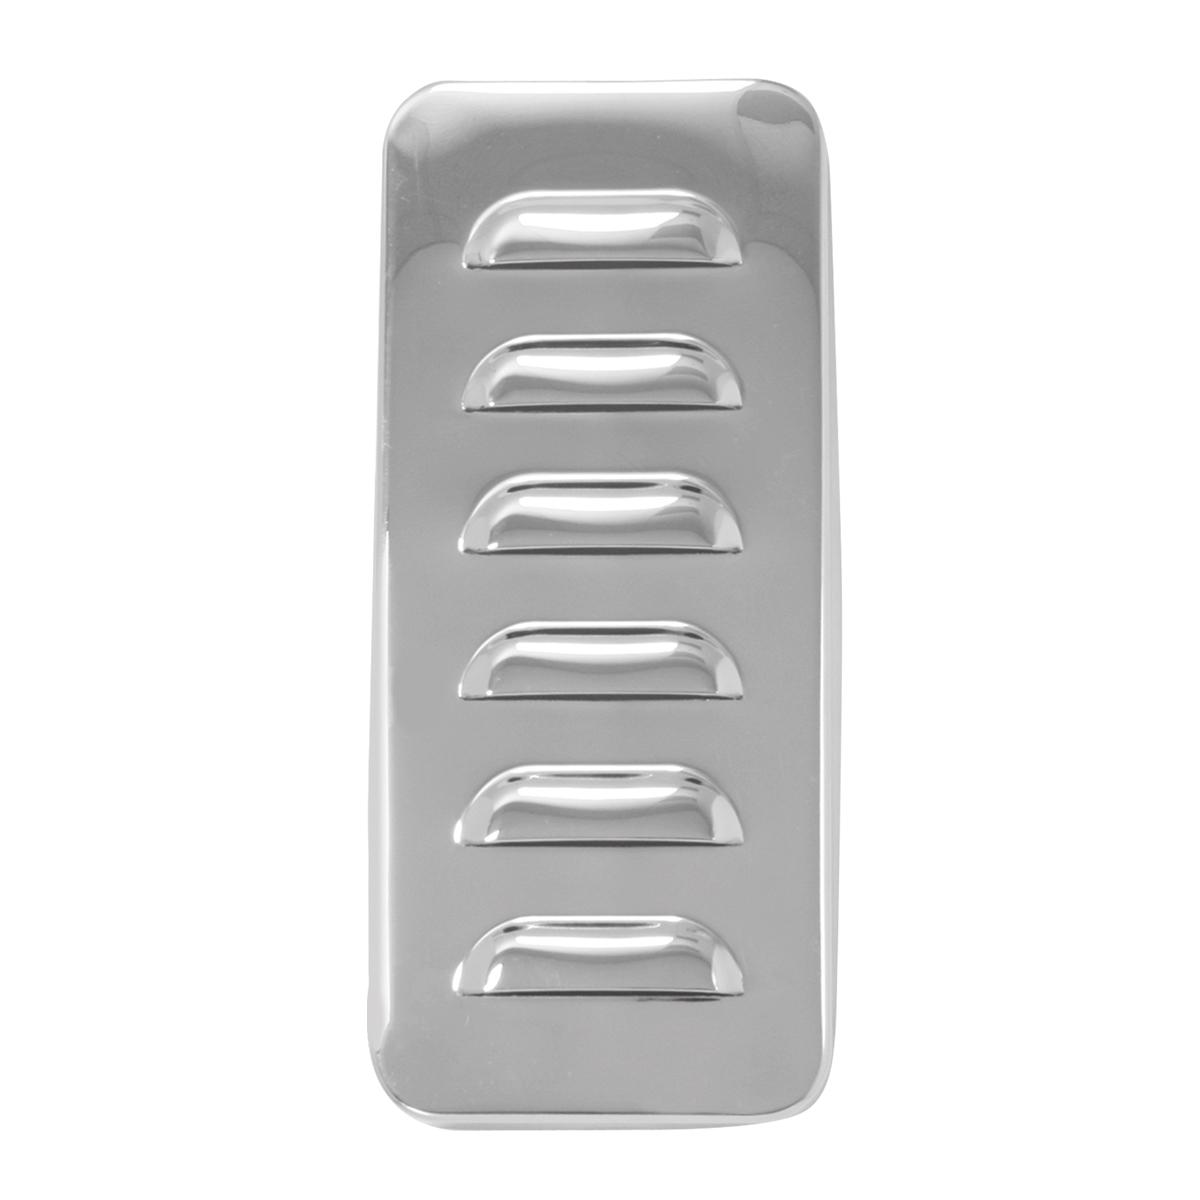 97569 Exterior Vent Door Cover Louver Style for Peterbilt